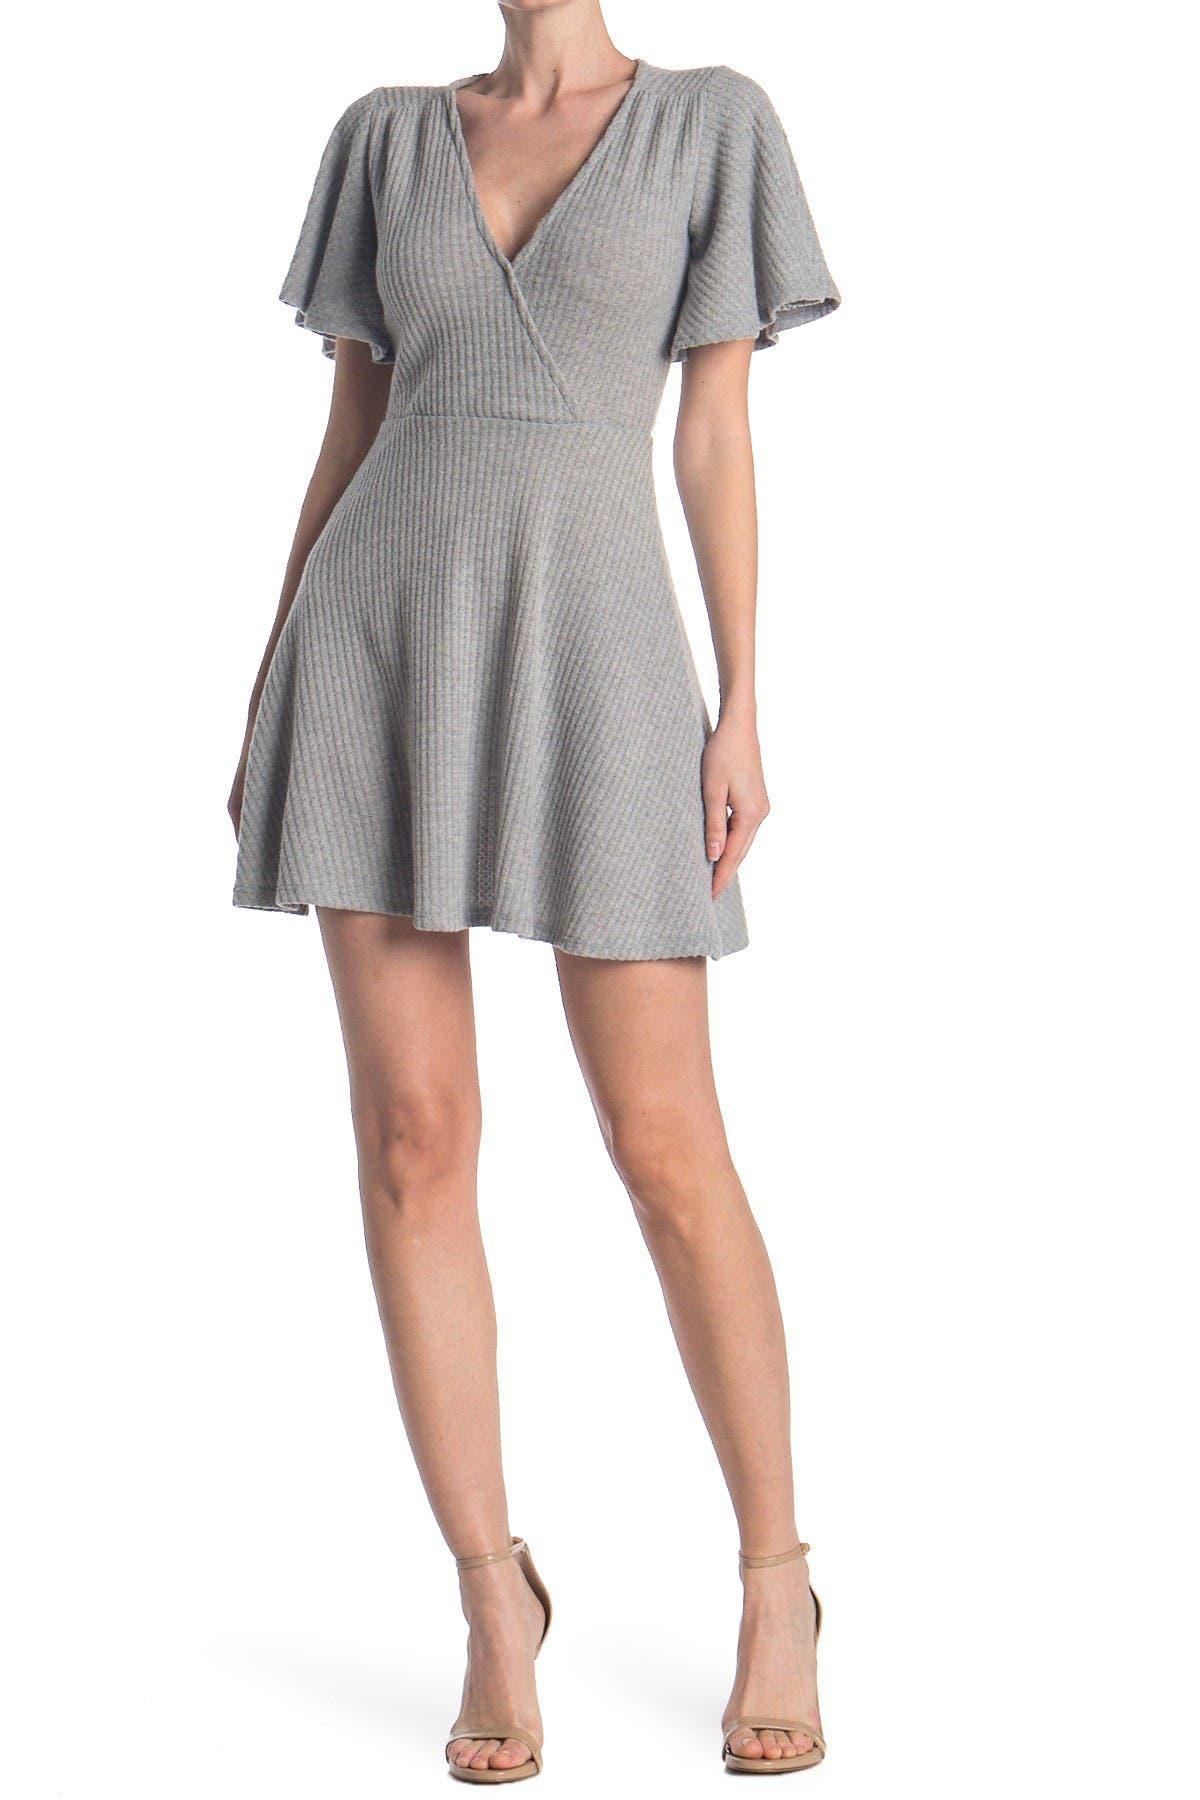 Image of Velvet Torch Rib Knit Faux Wrap Dress